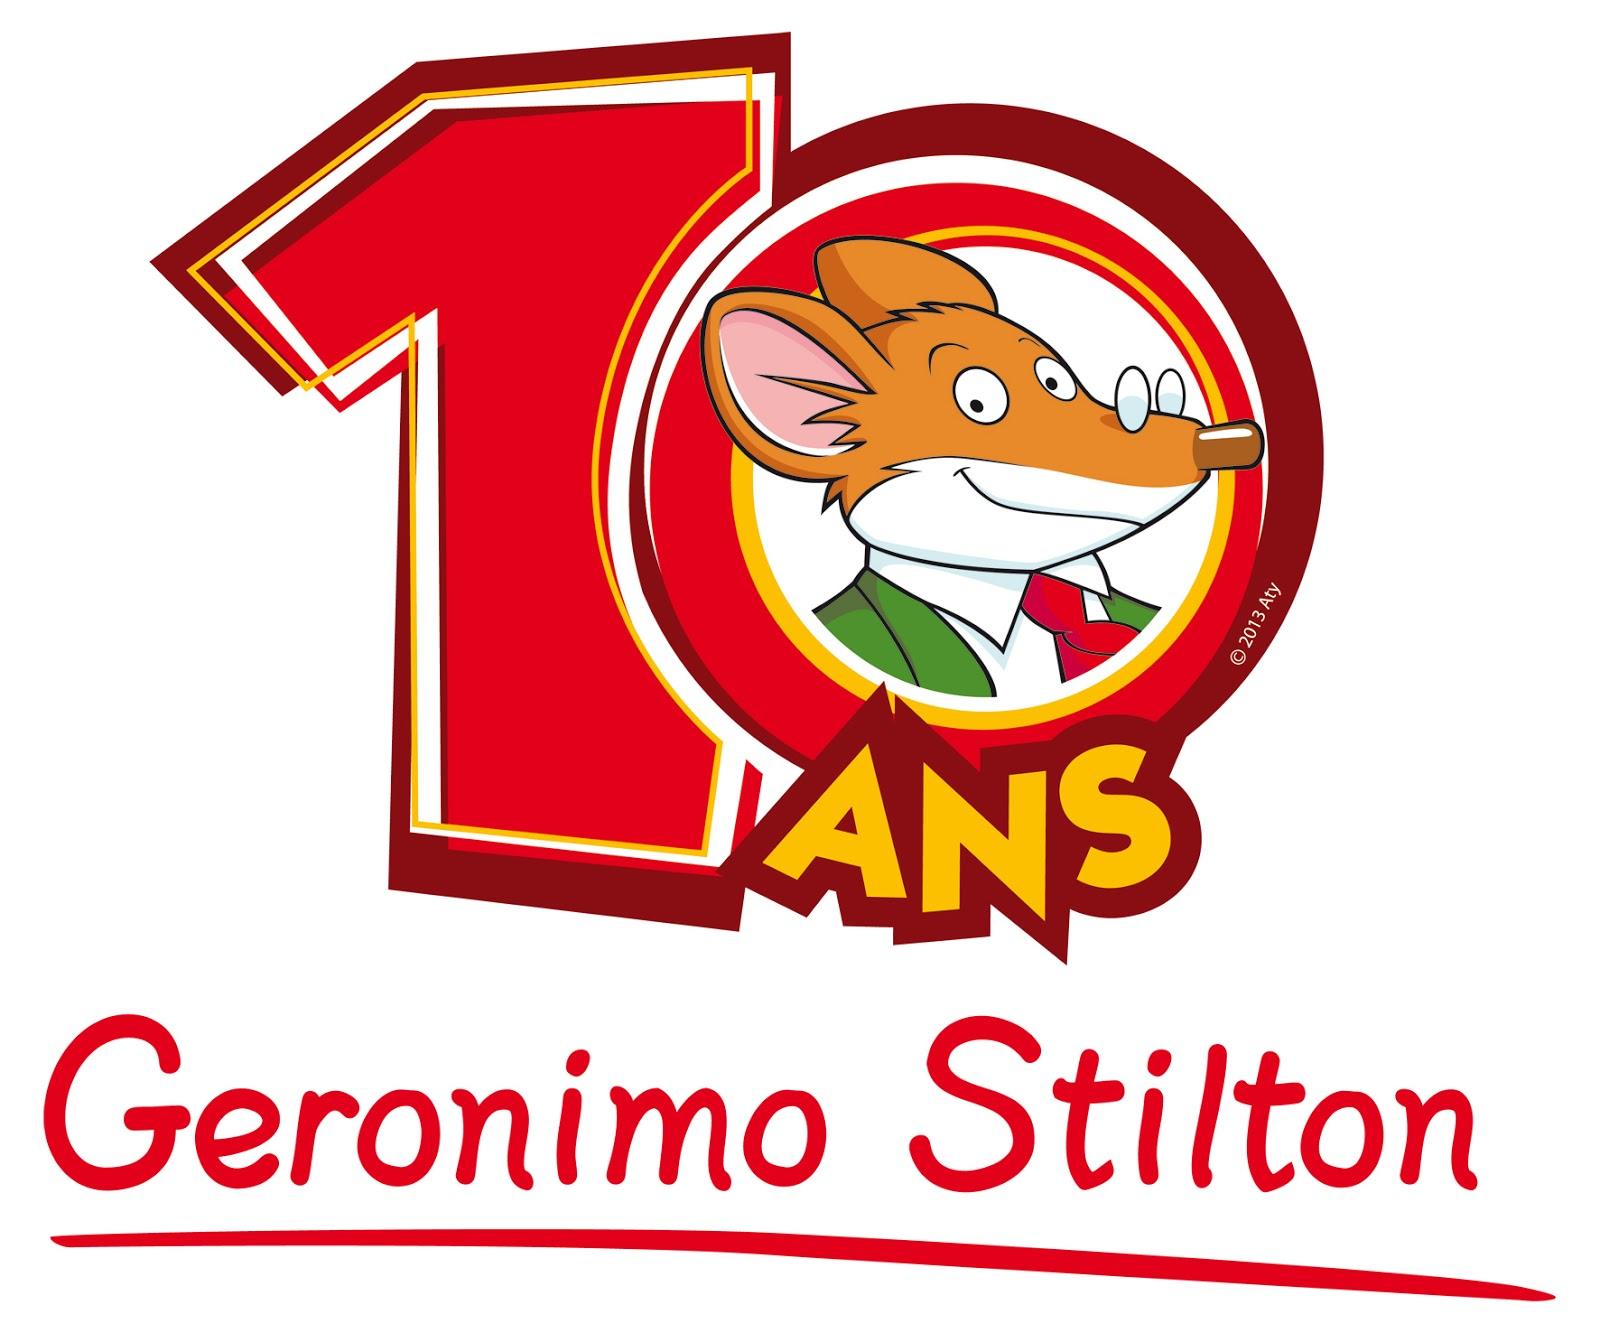 http://1.bp.blogspot.com/-b-VNzn3r7GQ/UOxGQKmcLEI/AAAAAAAABcw/Nug4iWhG5sU/s1600/Logo-10-ans-Stilton.jpg